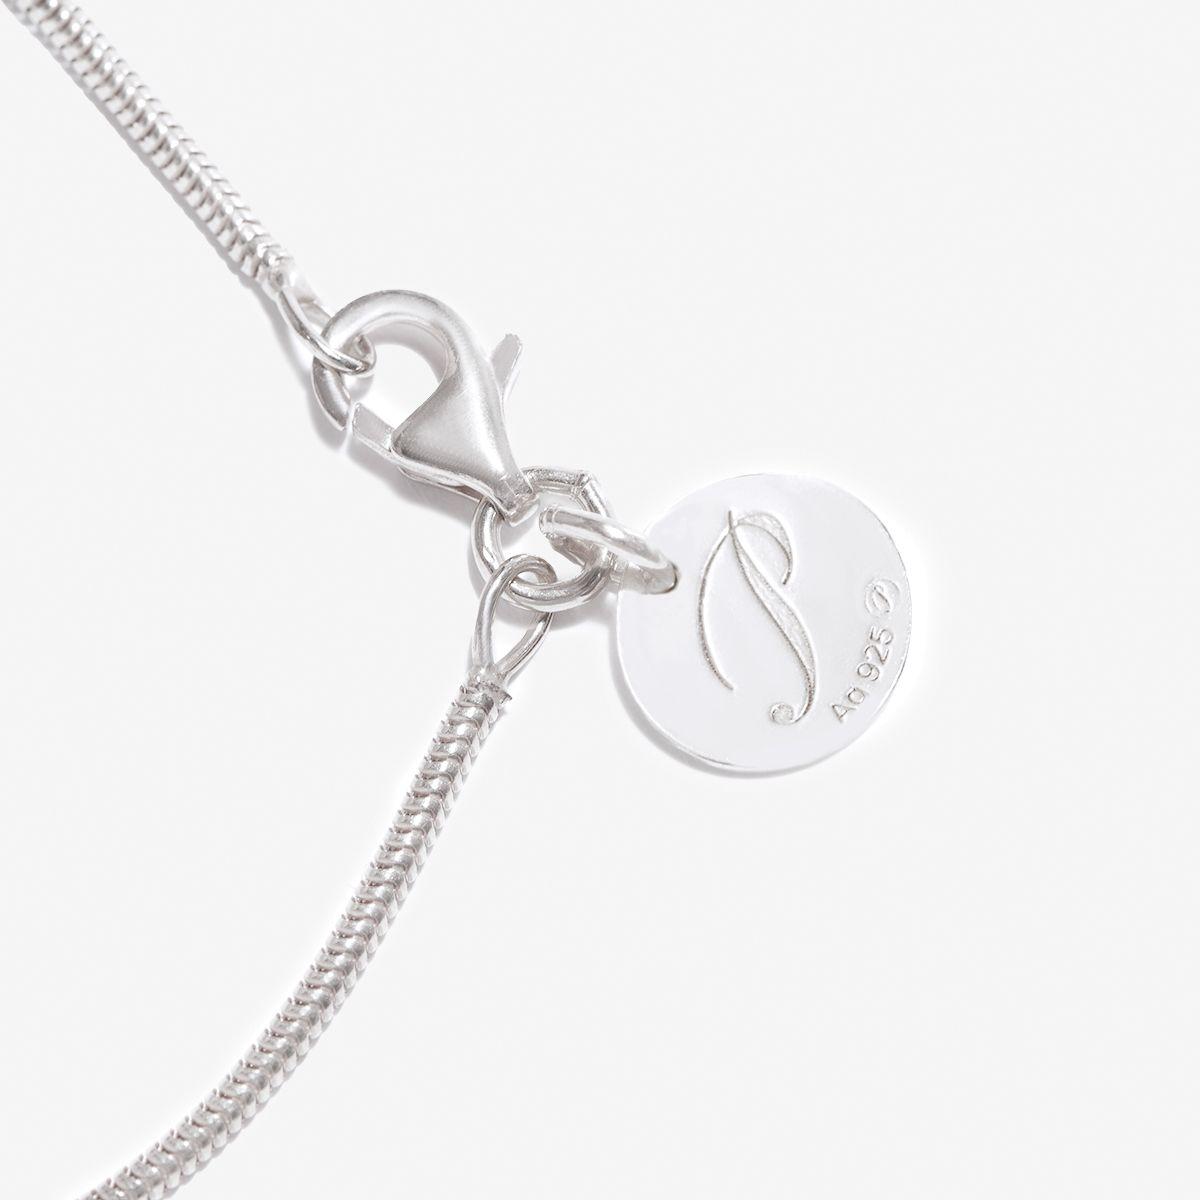 Calliope - Armband - Silber